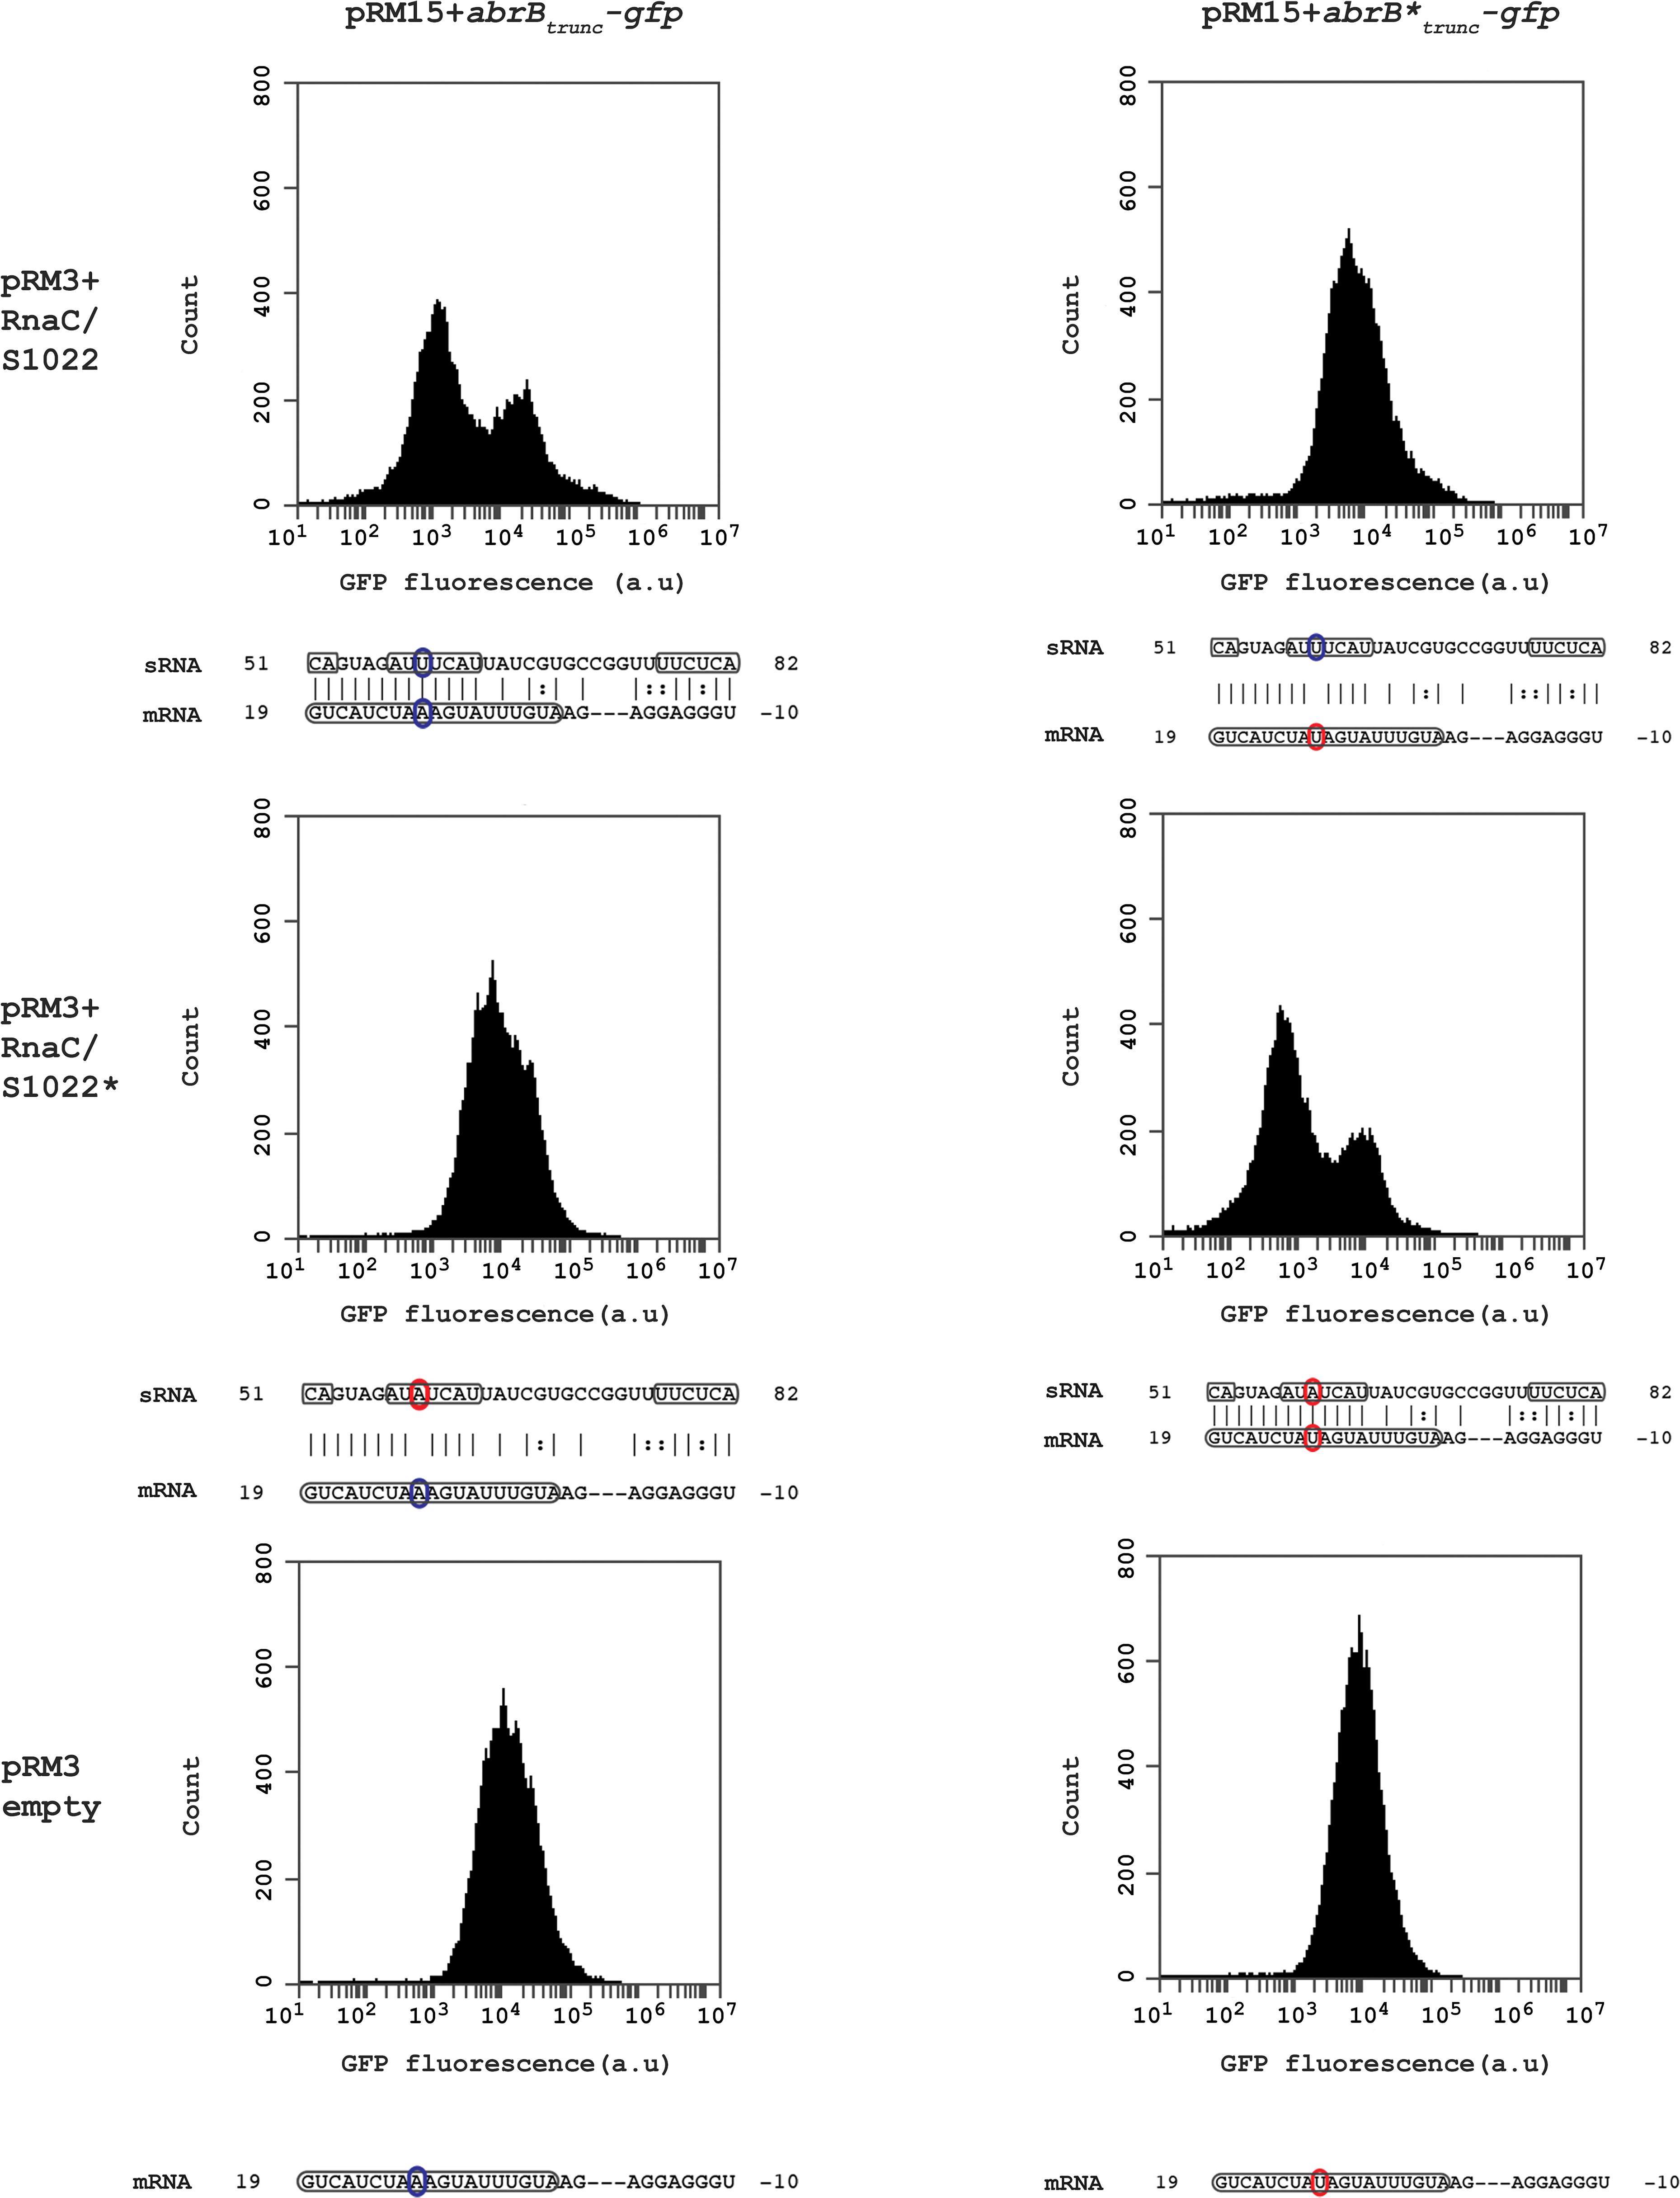 RnaC/S1022 regulates abrB by a direct mRNA-sRNA interaction.